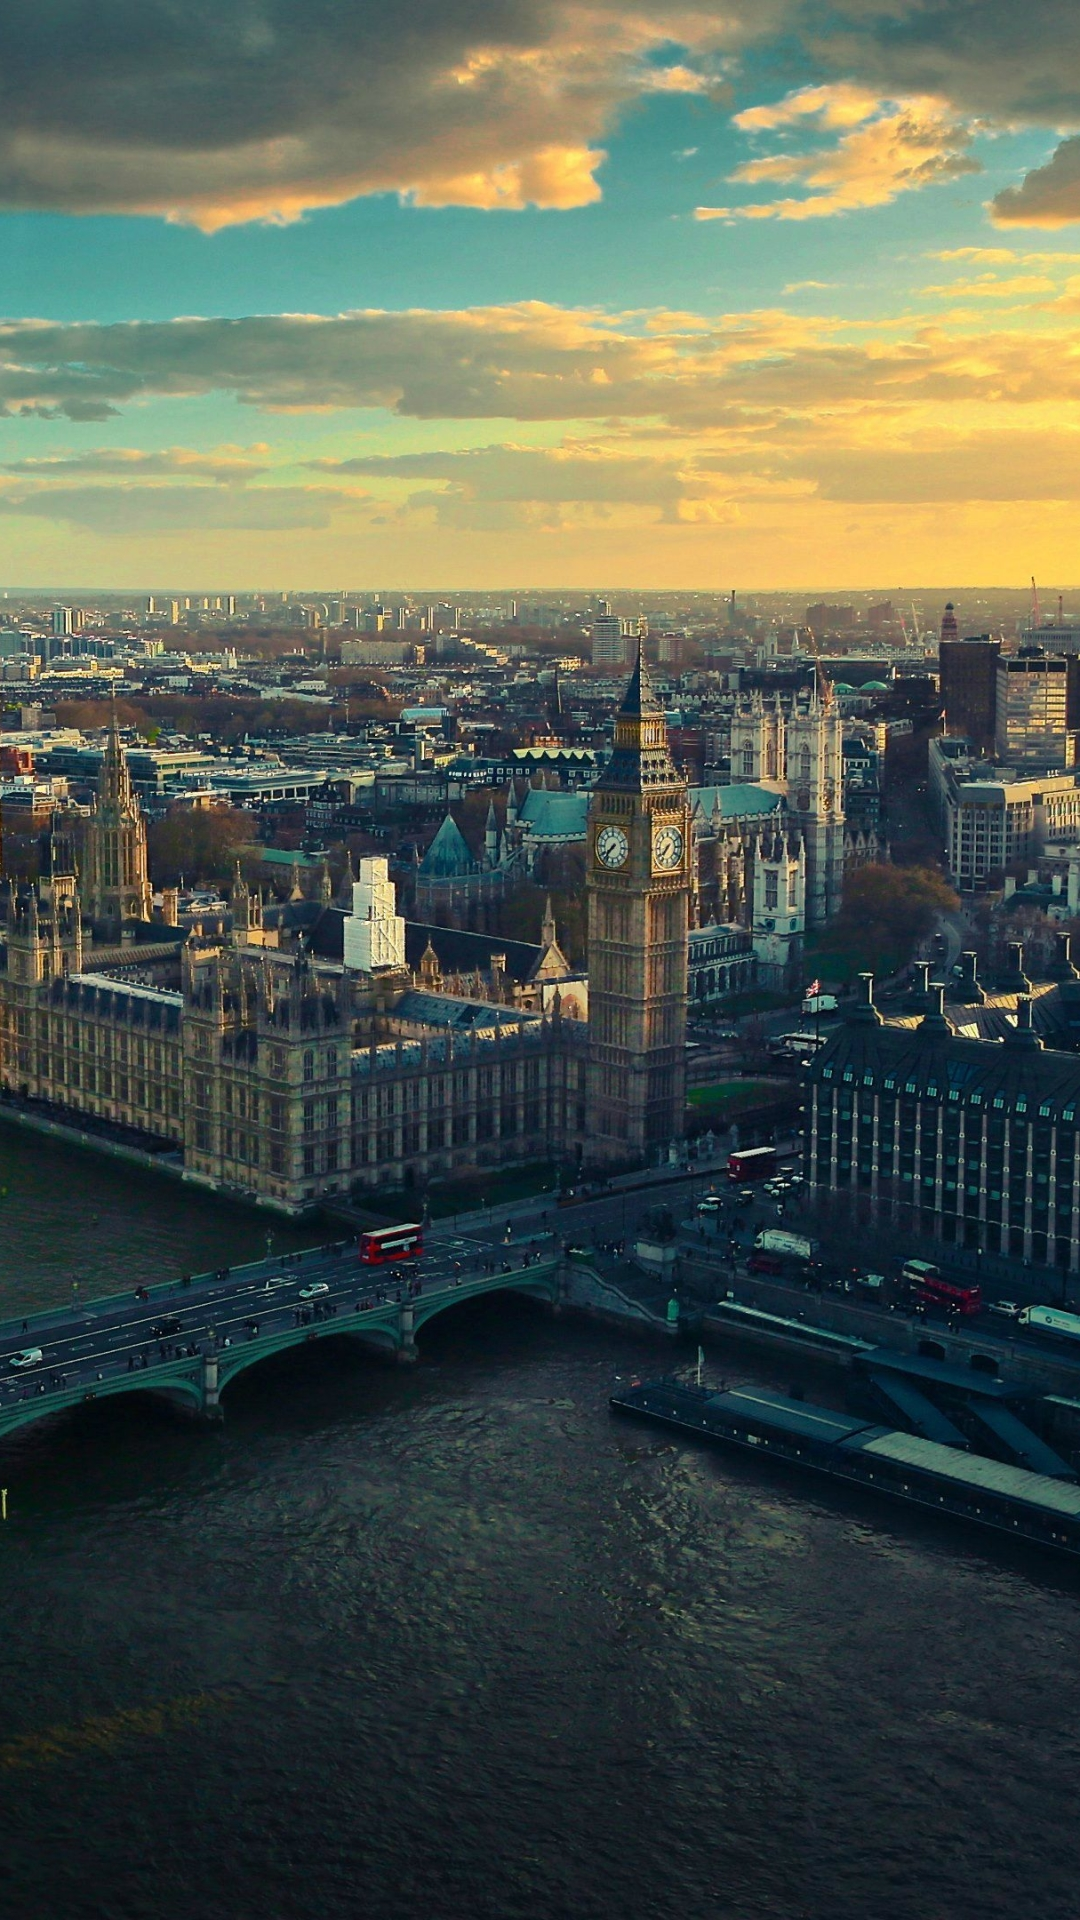 Man Made London 1080x1920 Mobile Wallpaper